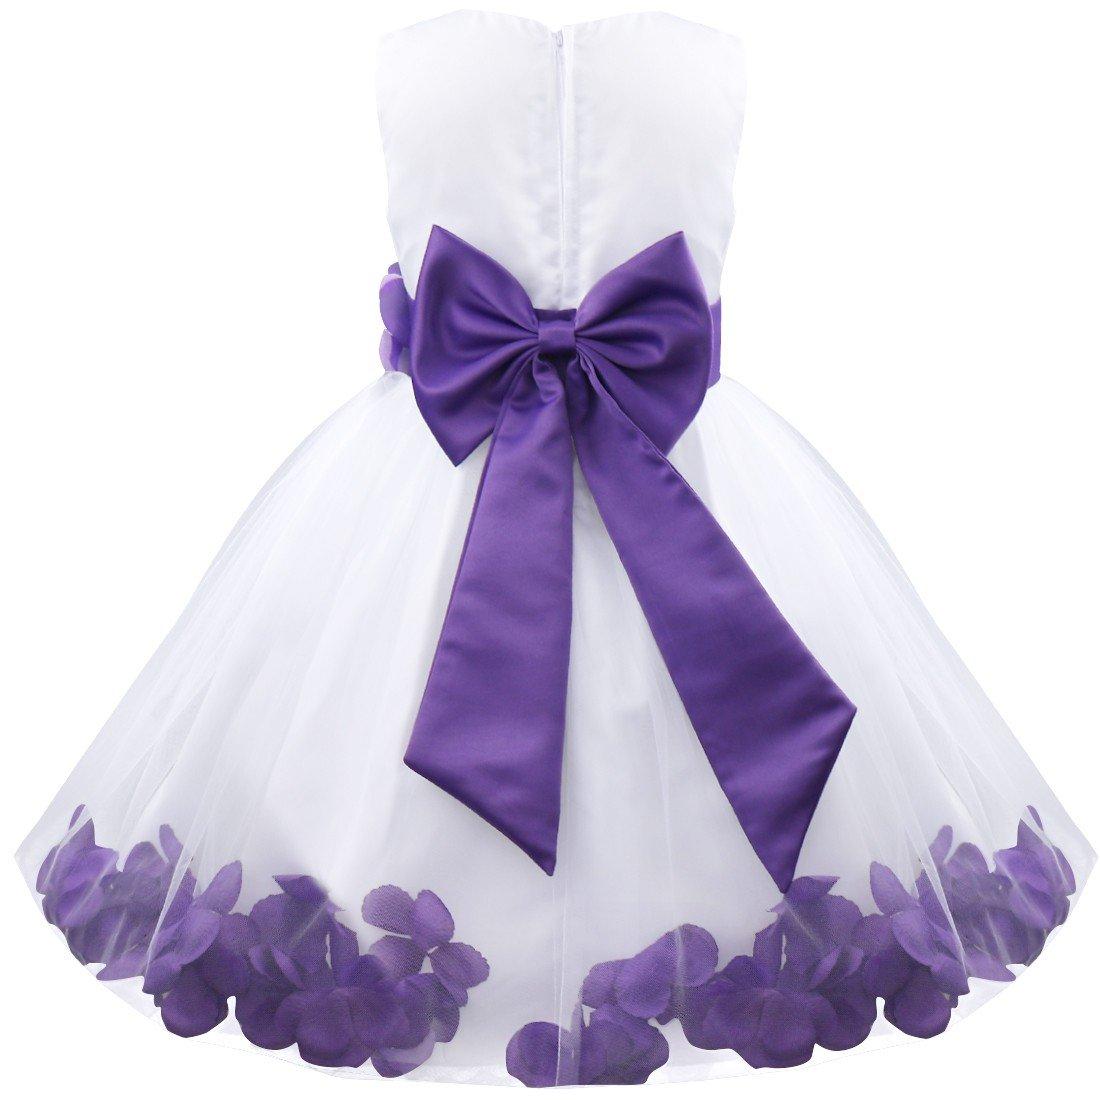 Bridesmaid Dress Children: Amazon.co.uk